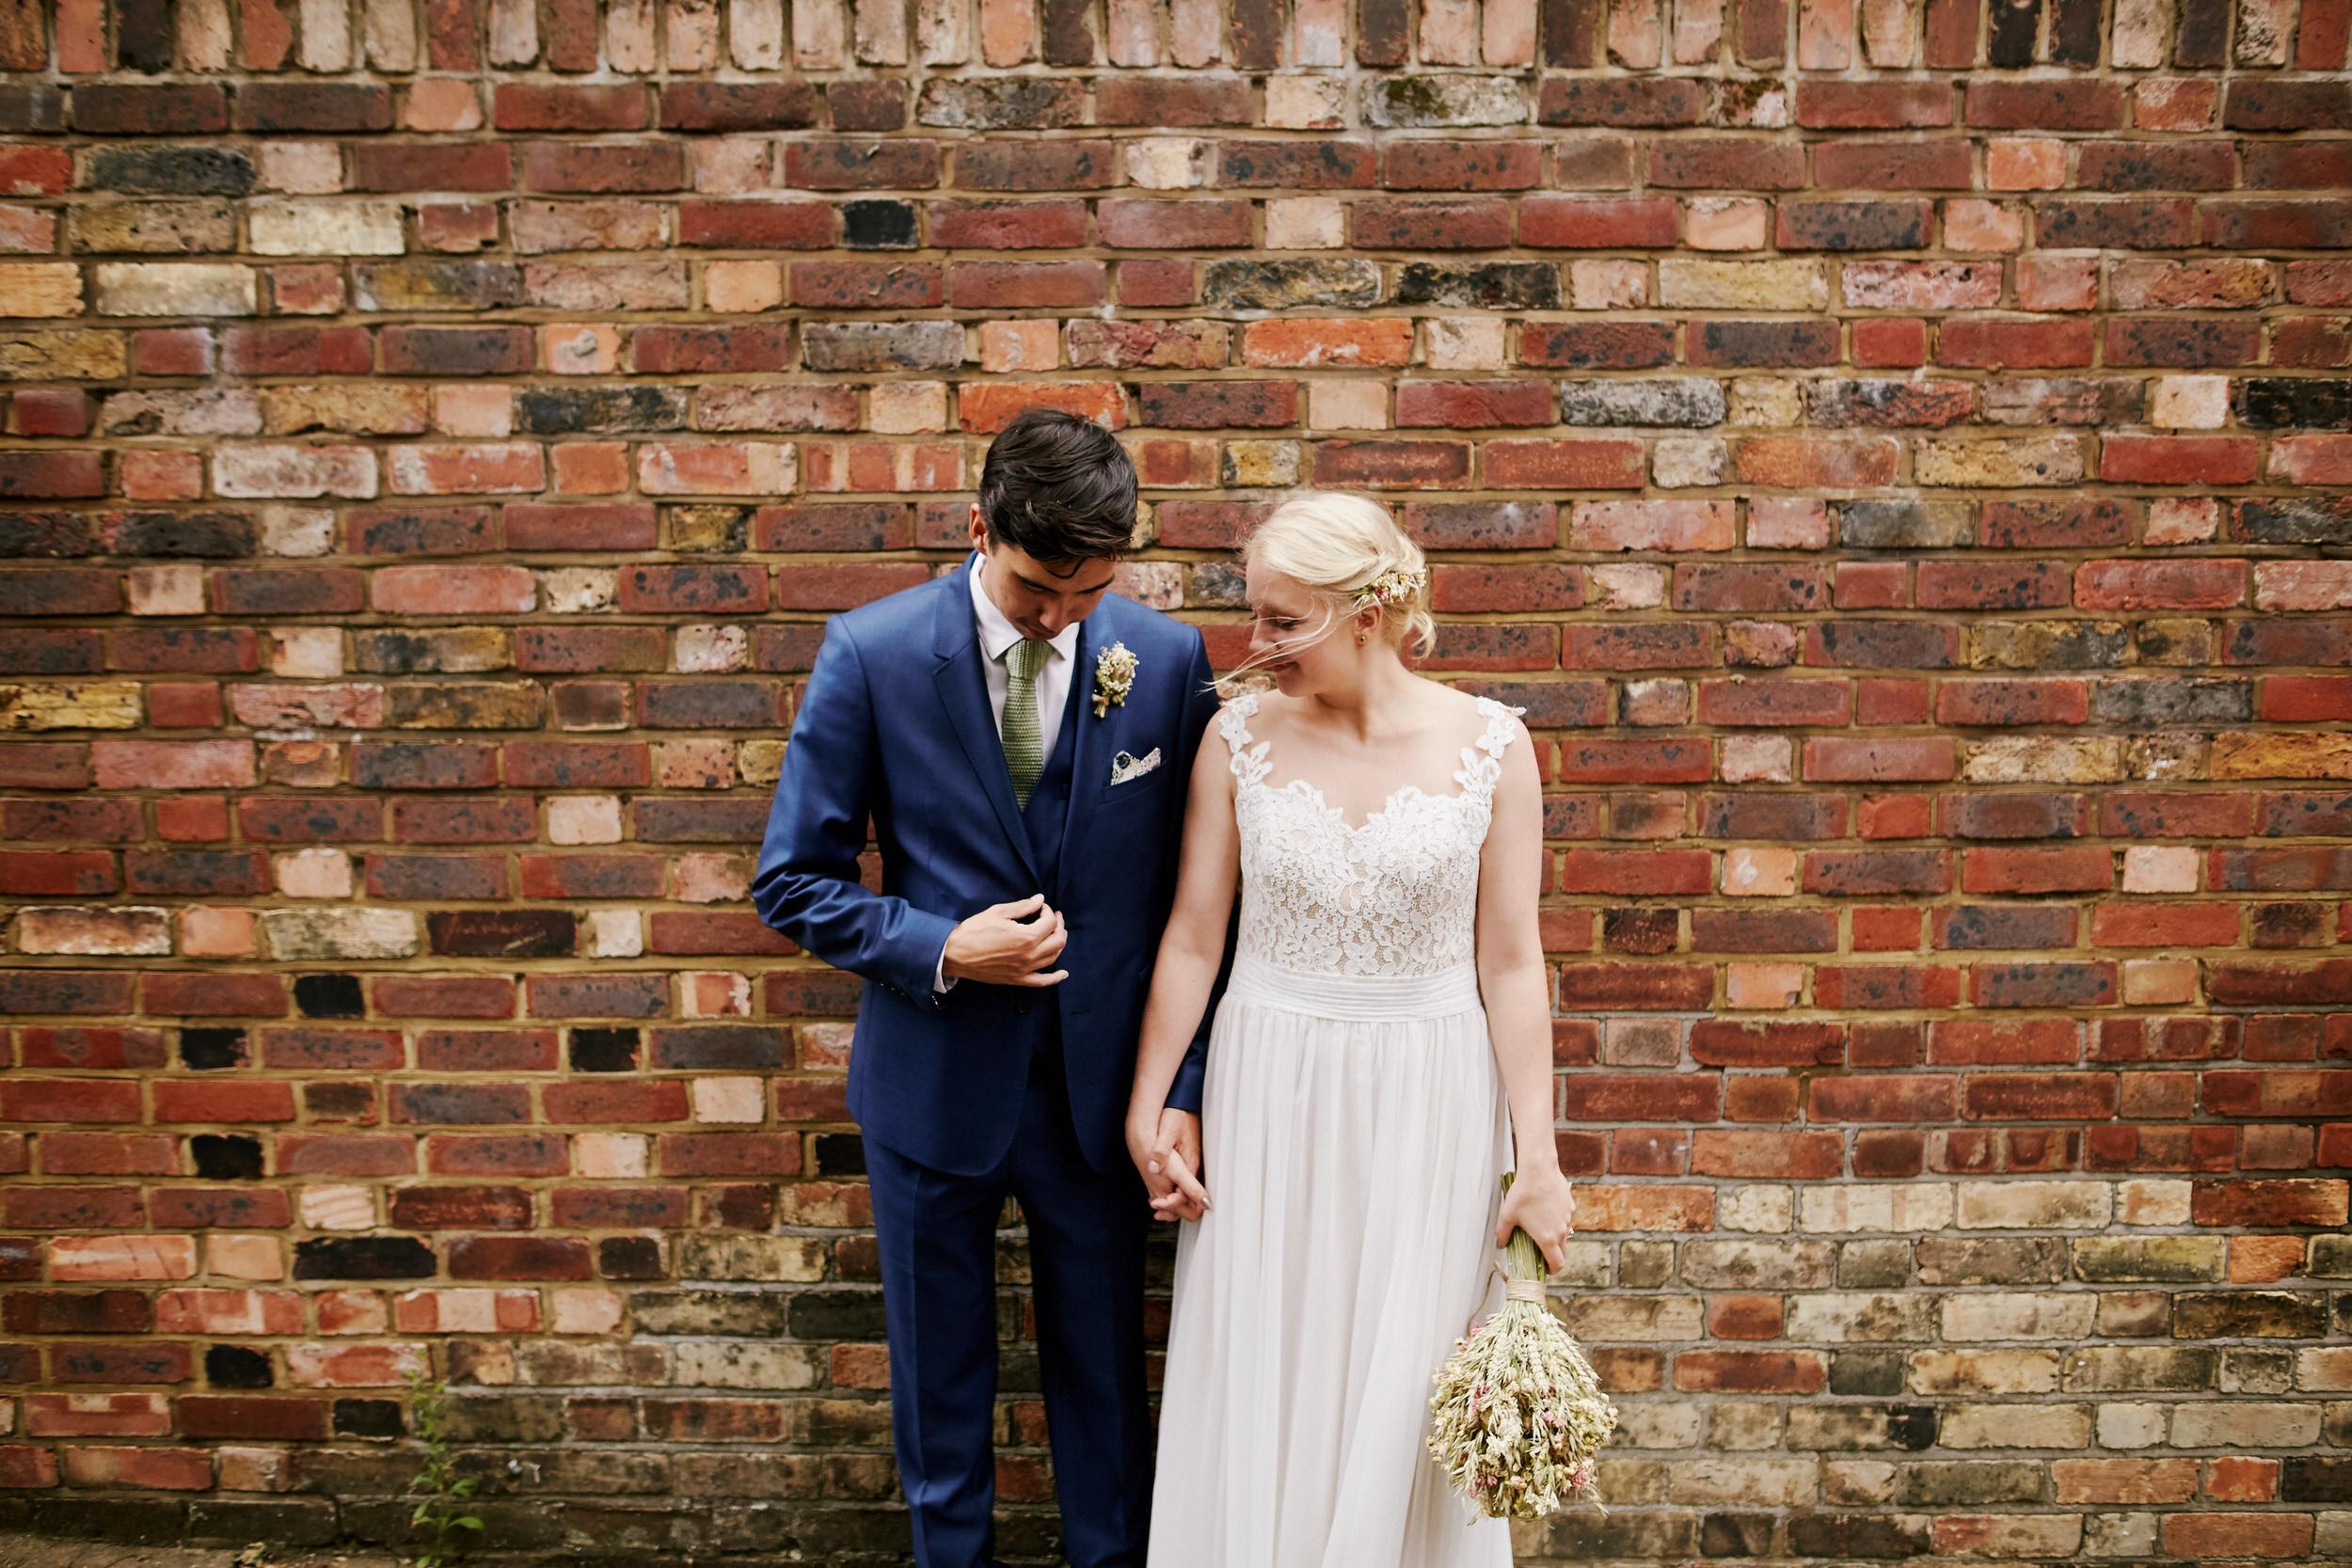 Wedding in London - Echoes & Wild Hearts 0026.jpg